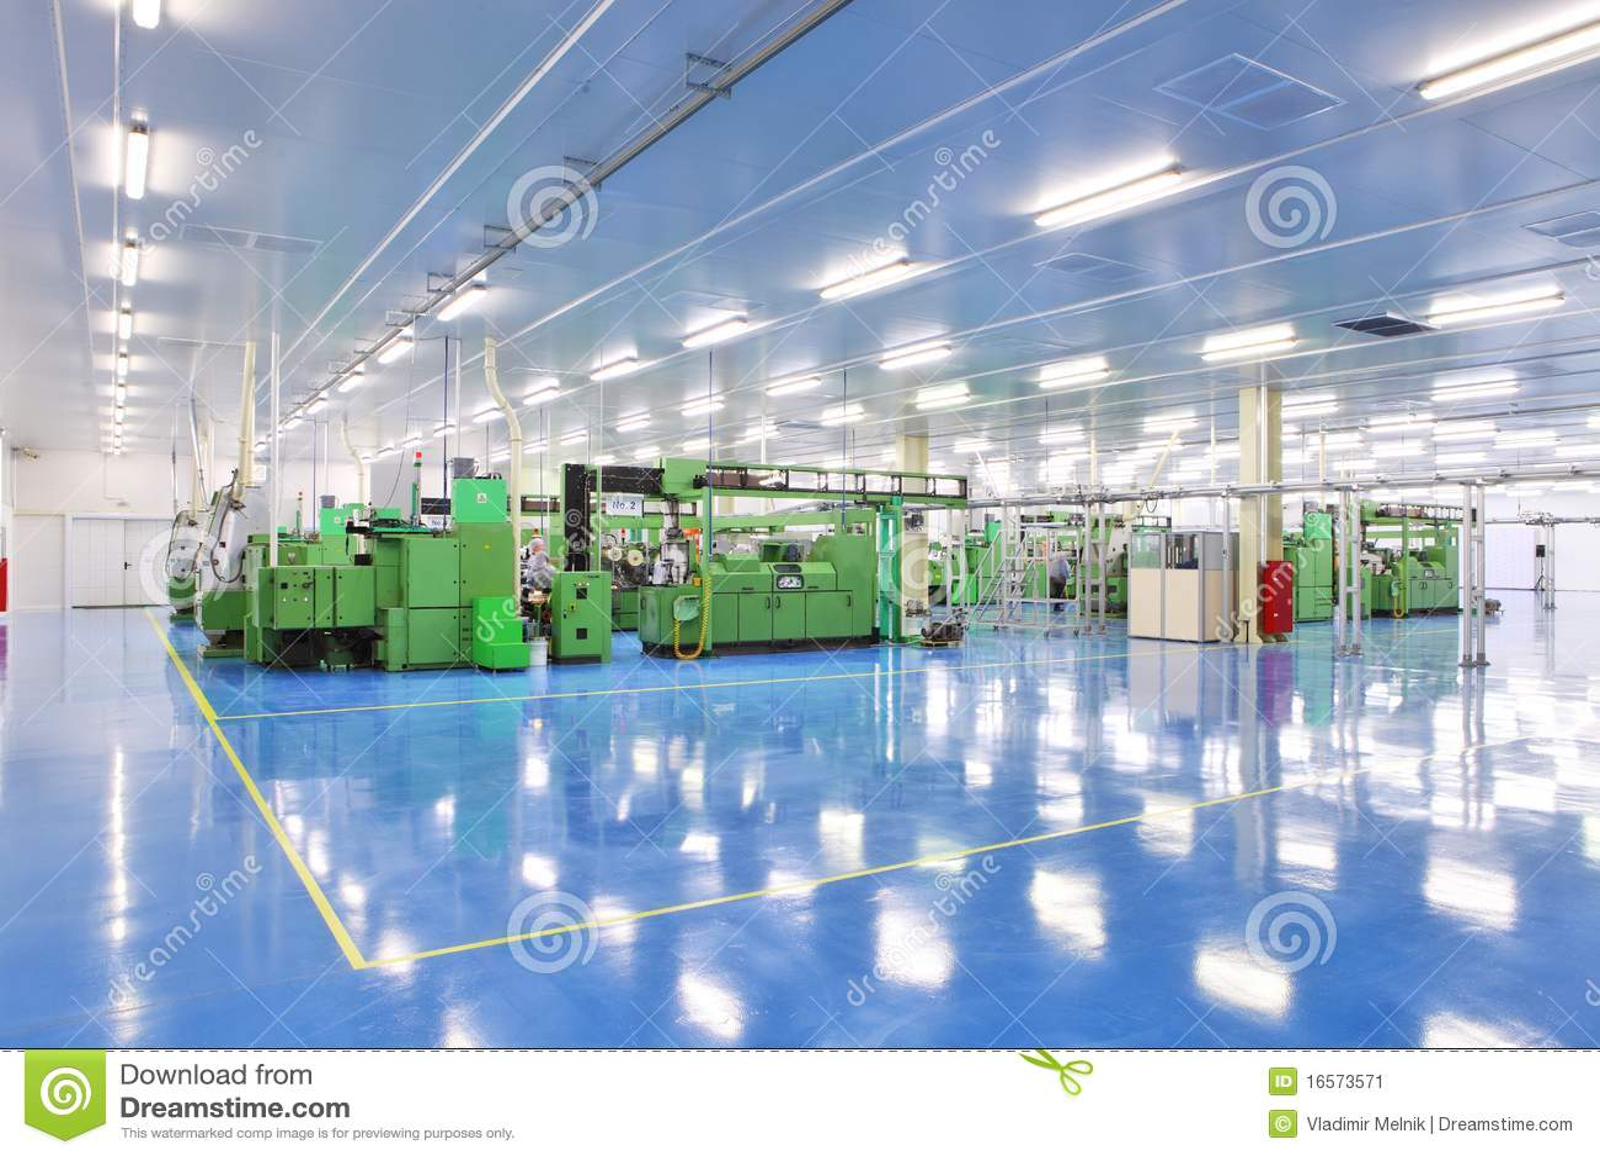 Industriële ruimte